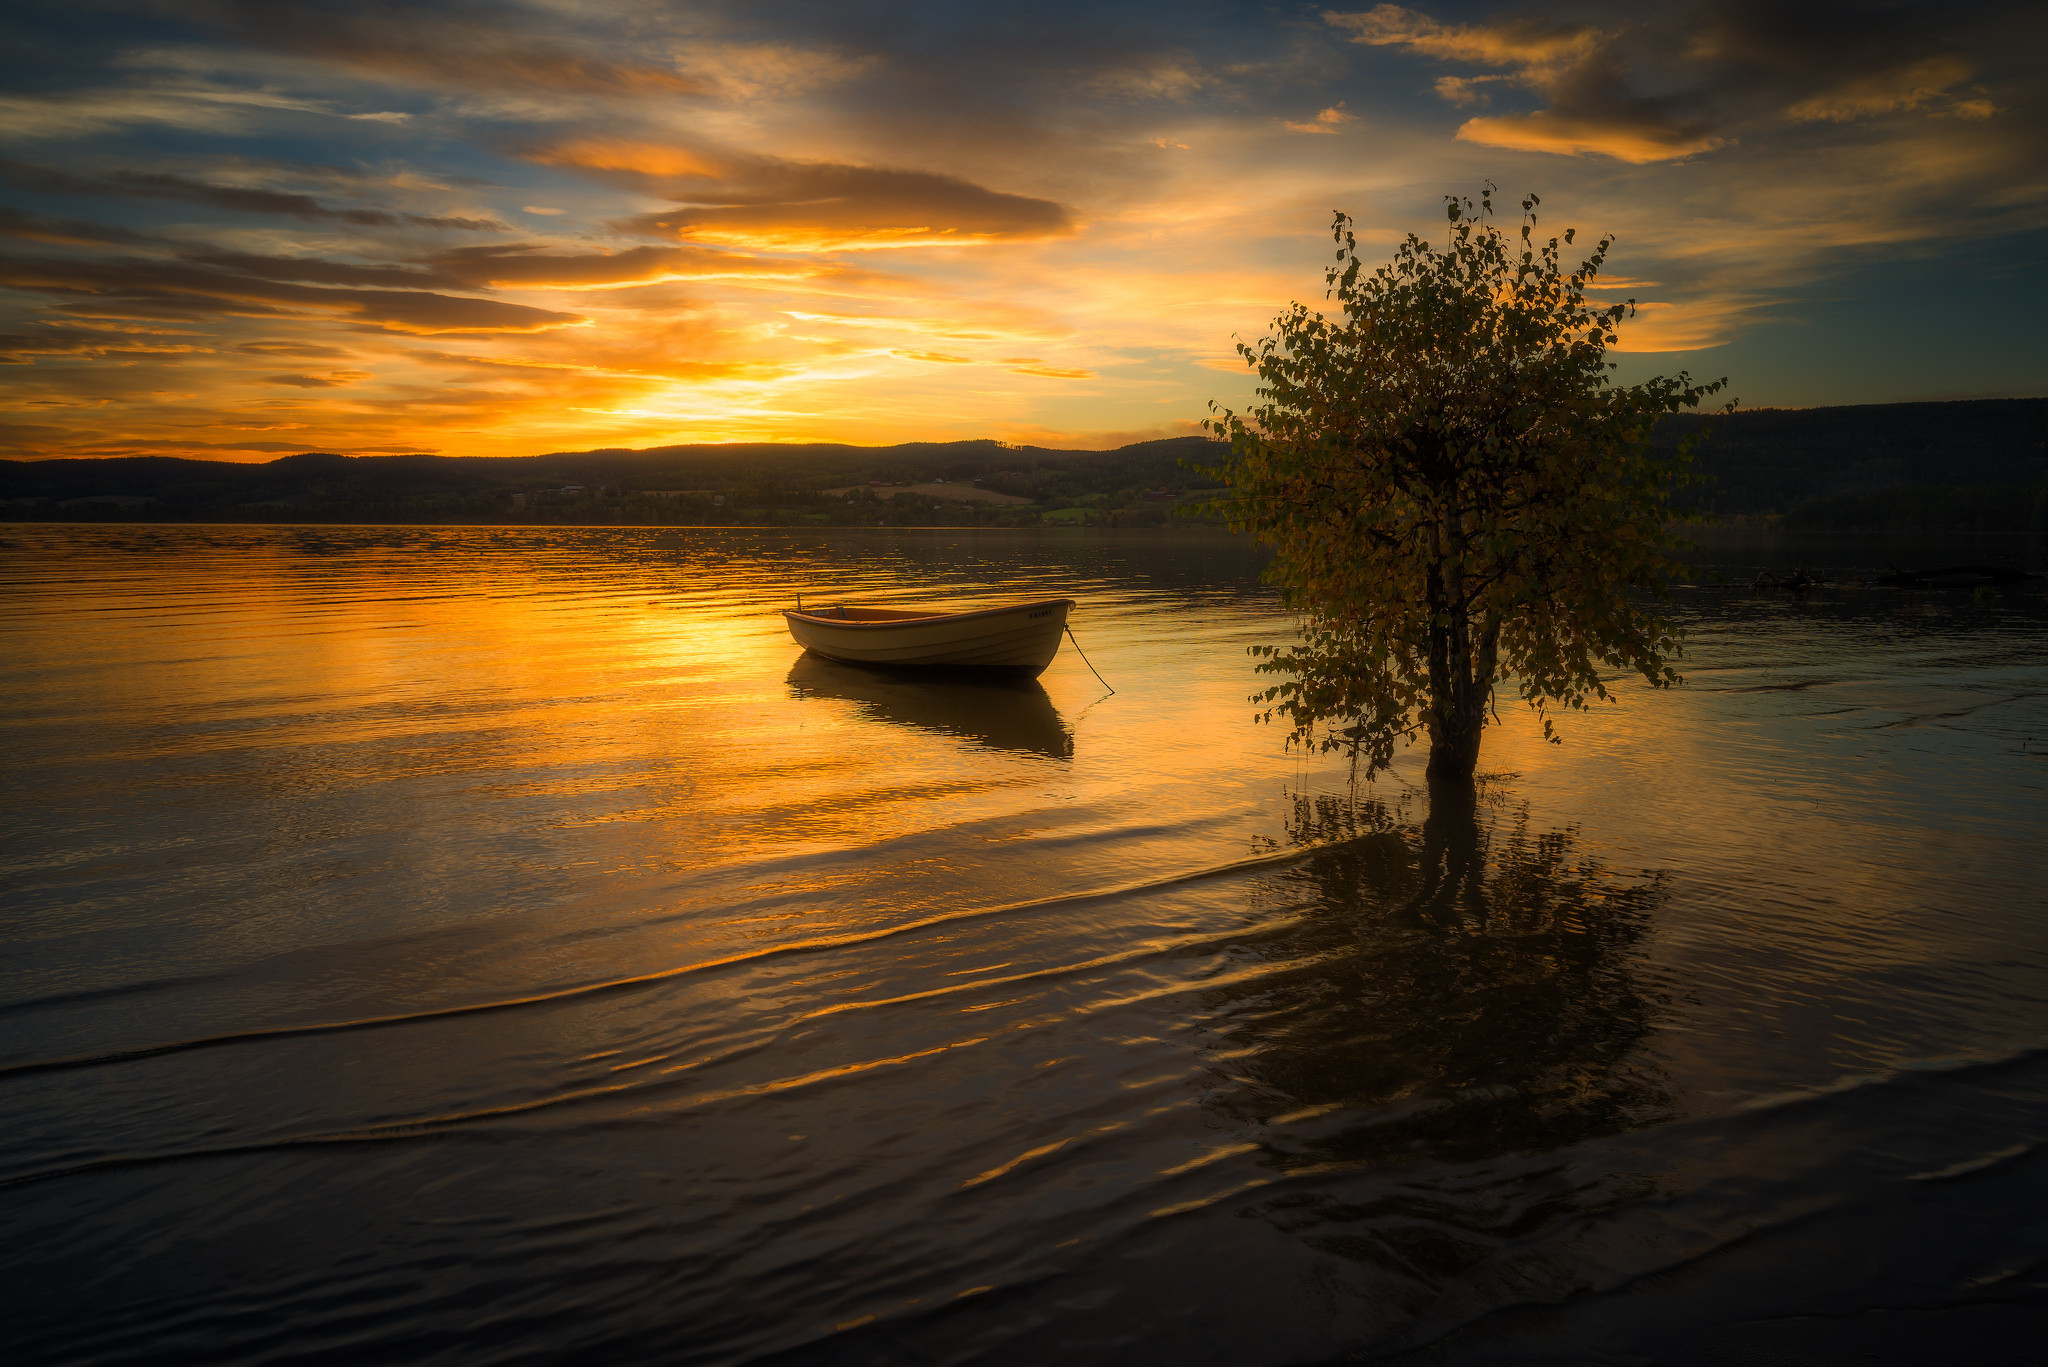 Wallpaper Fisherman Sunset Boat Hd Creative Graphics: Photography Lake Boat, HD Photography, 4k Wallpapers